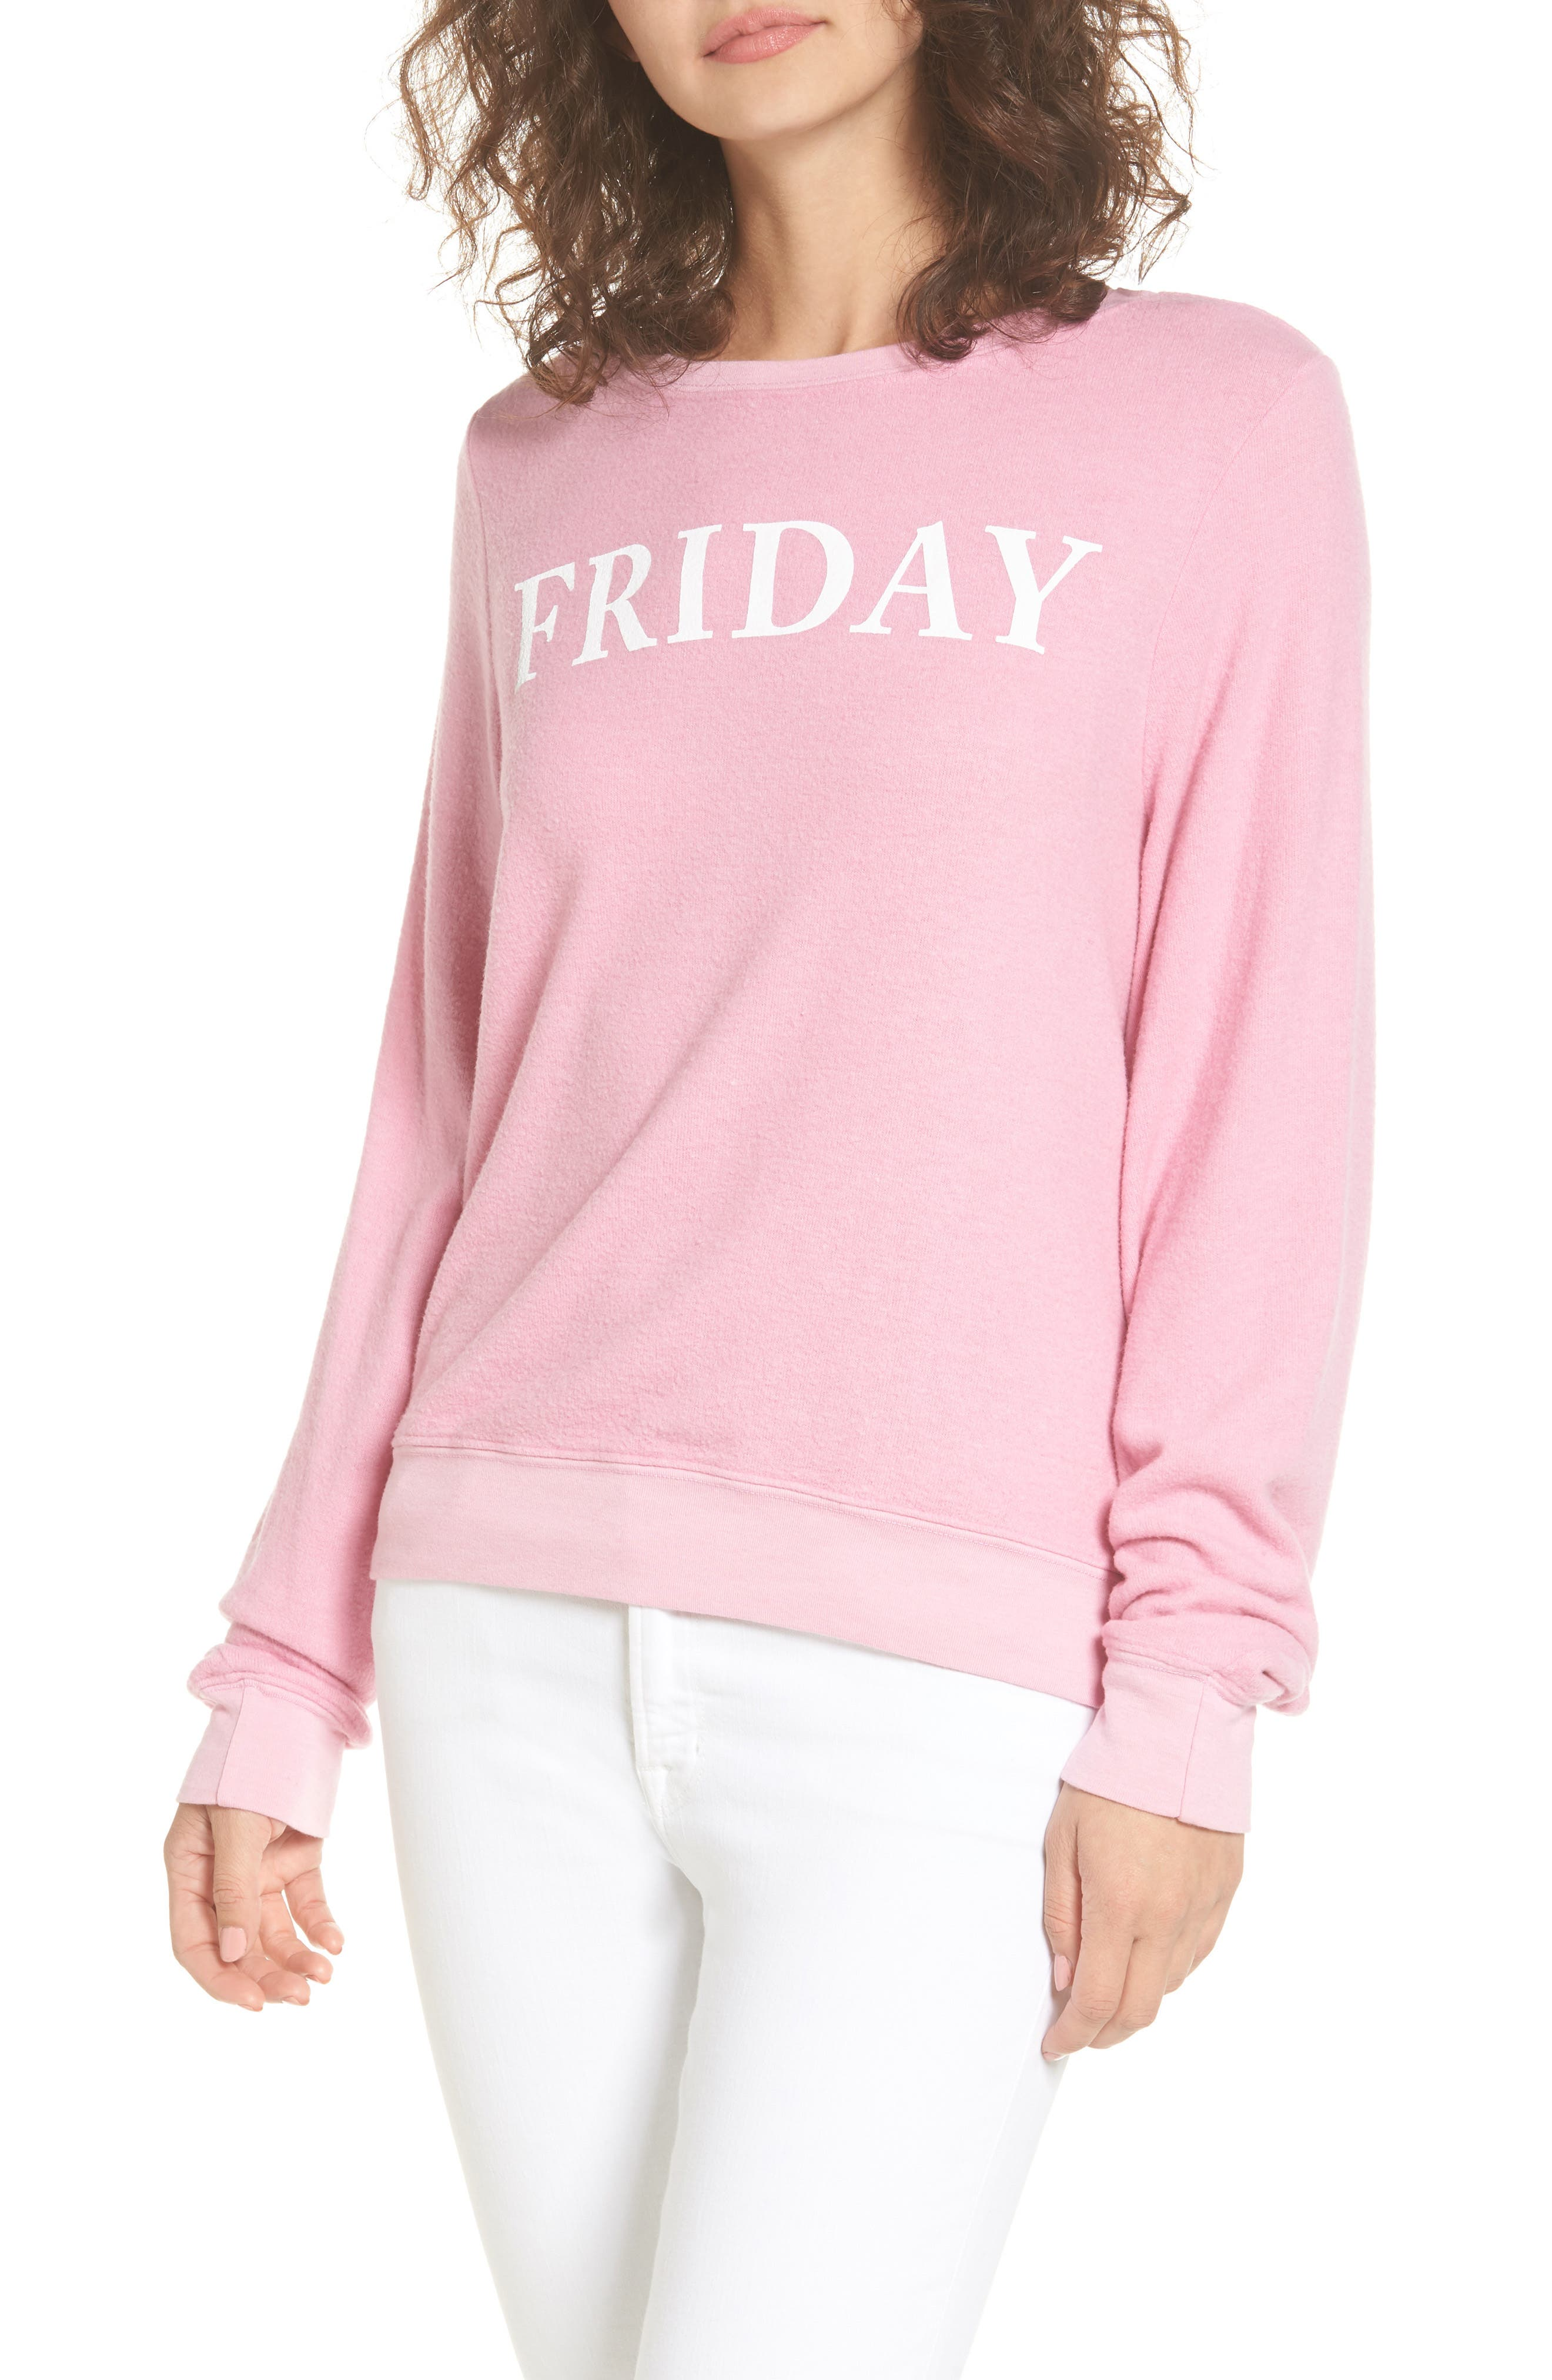 Friday Sweatshirt,                         Main,                         color, Pink